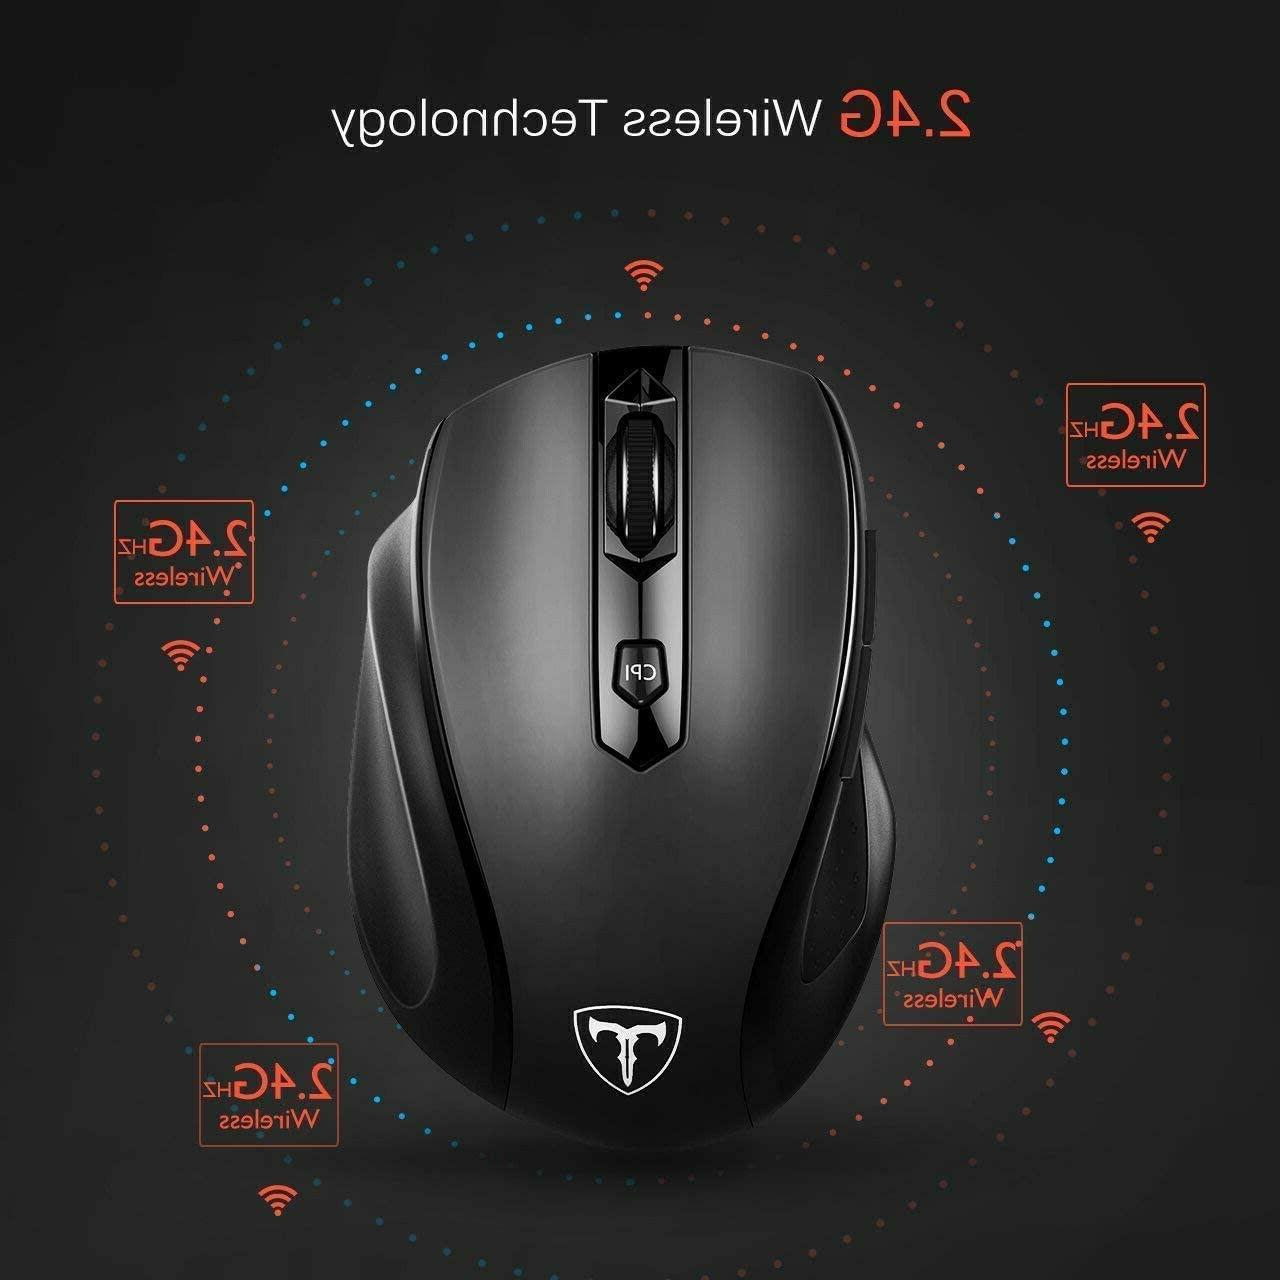 New Wireless Optical Mouse—Black, Adjustable DPI,